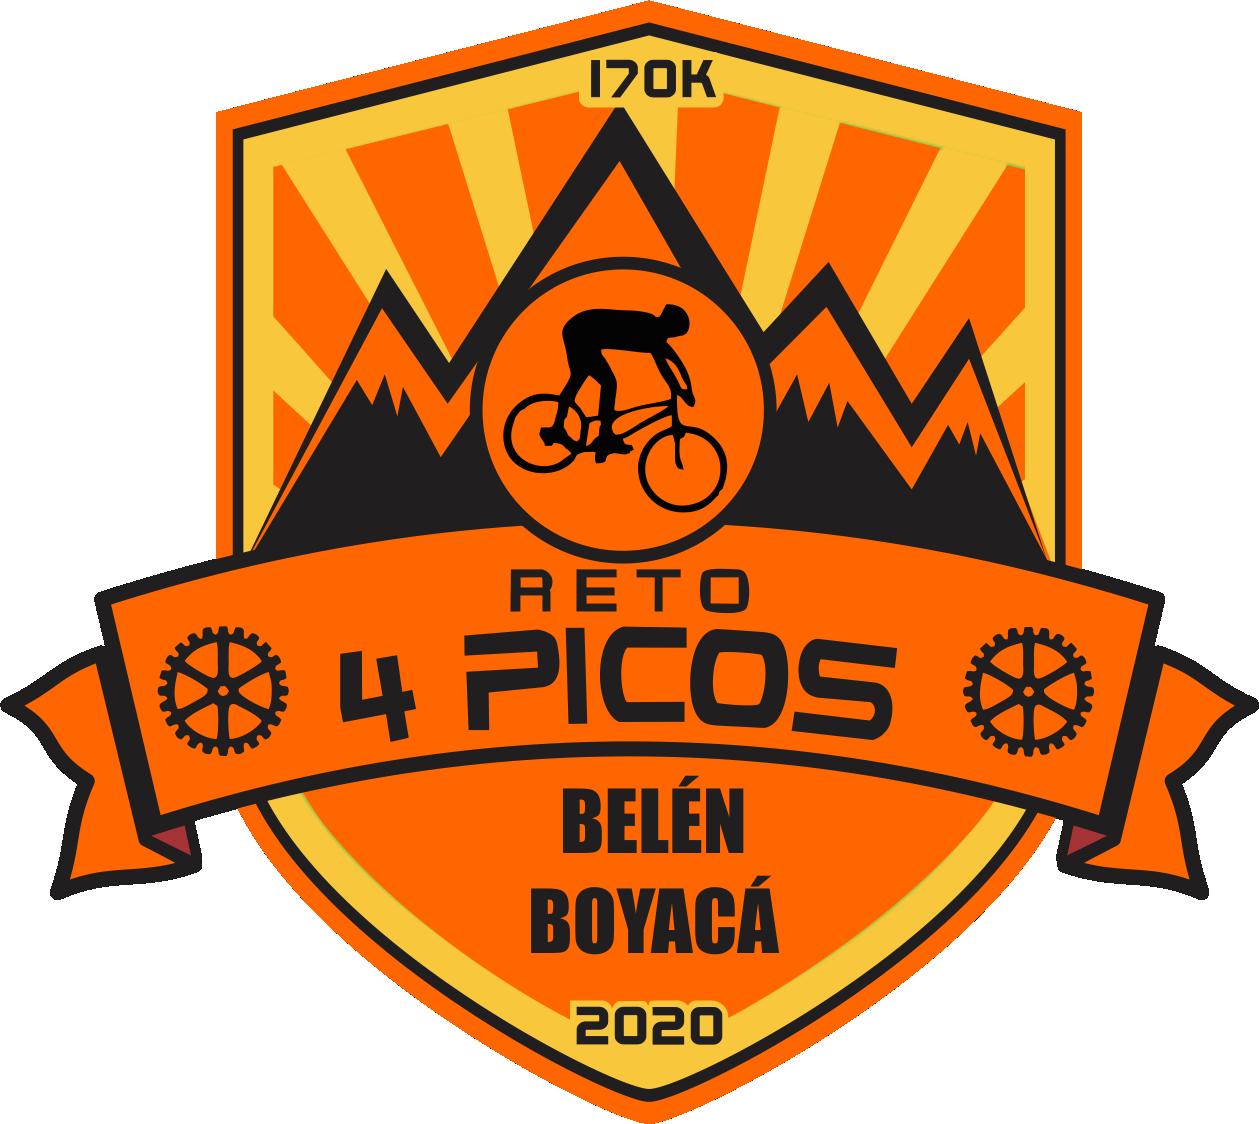 Logo 4 picos 2020  png